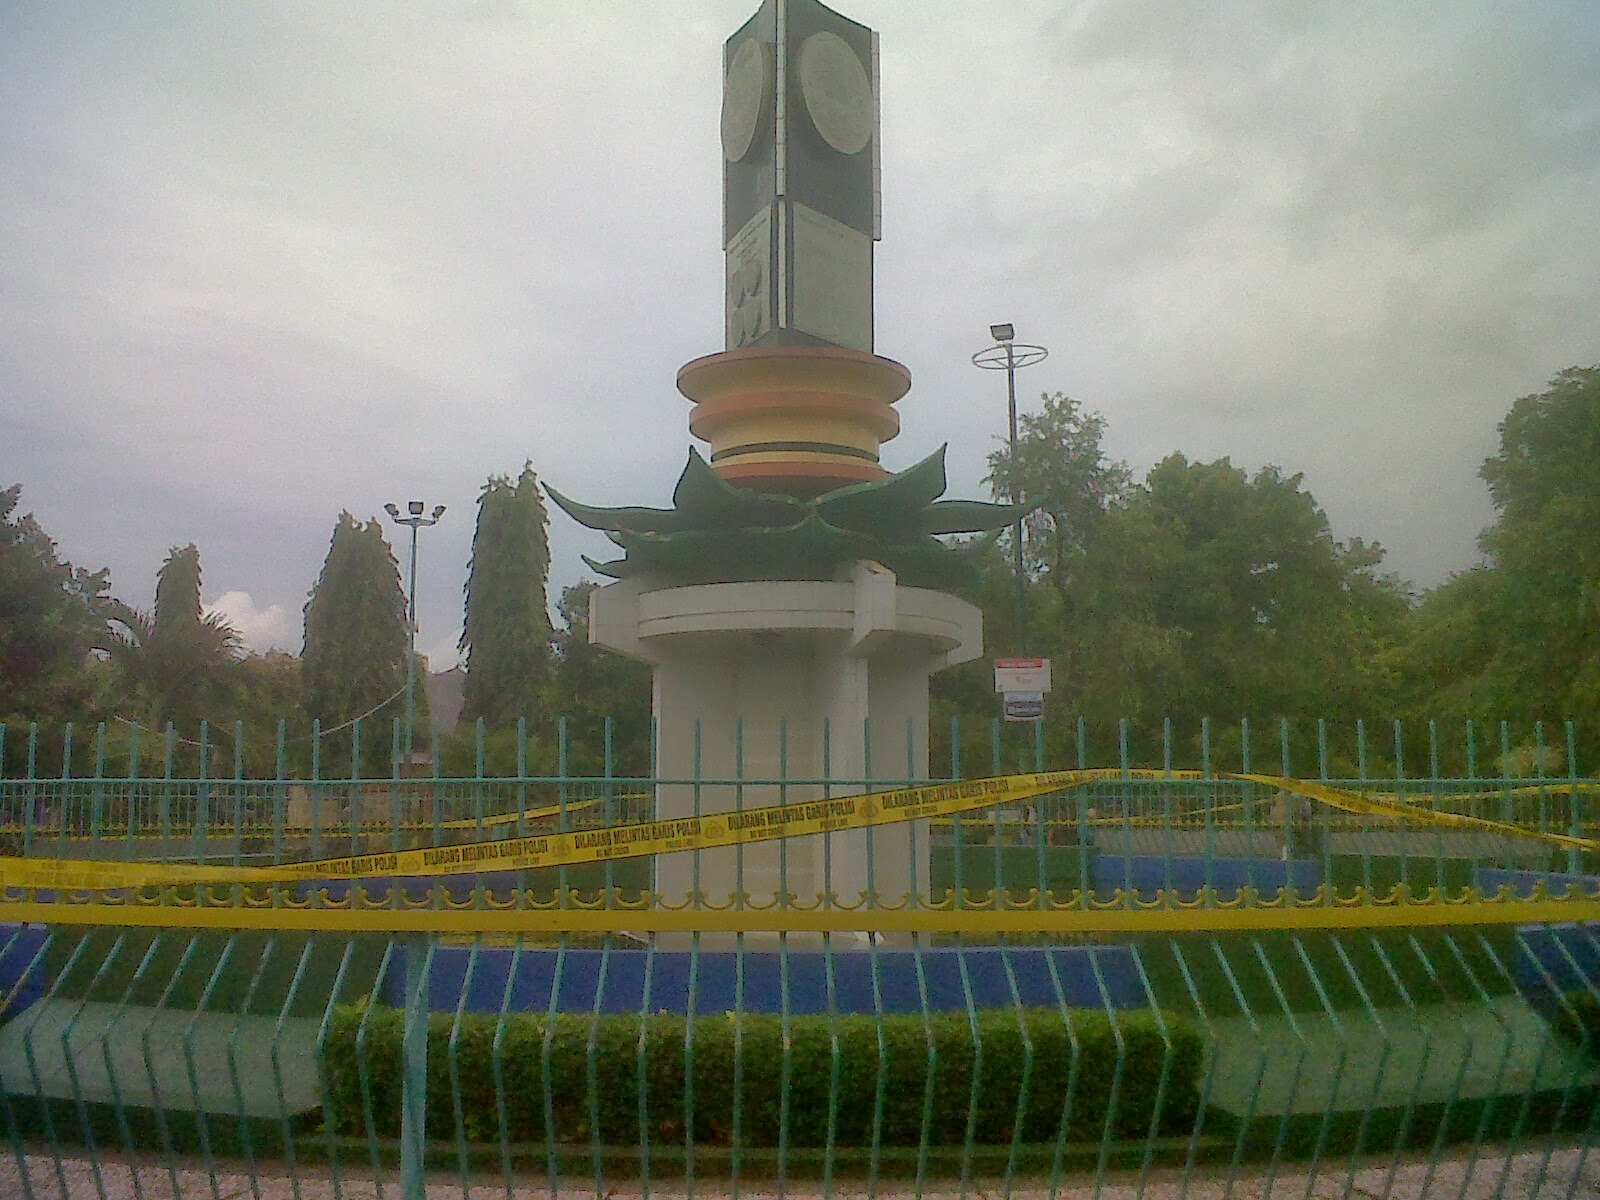 Siswa Tewas Monumen Adipura Sumenep Lintas Madura News Taman Kota